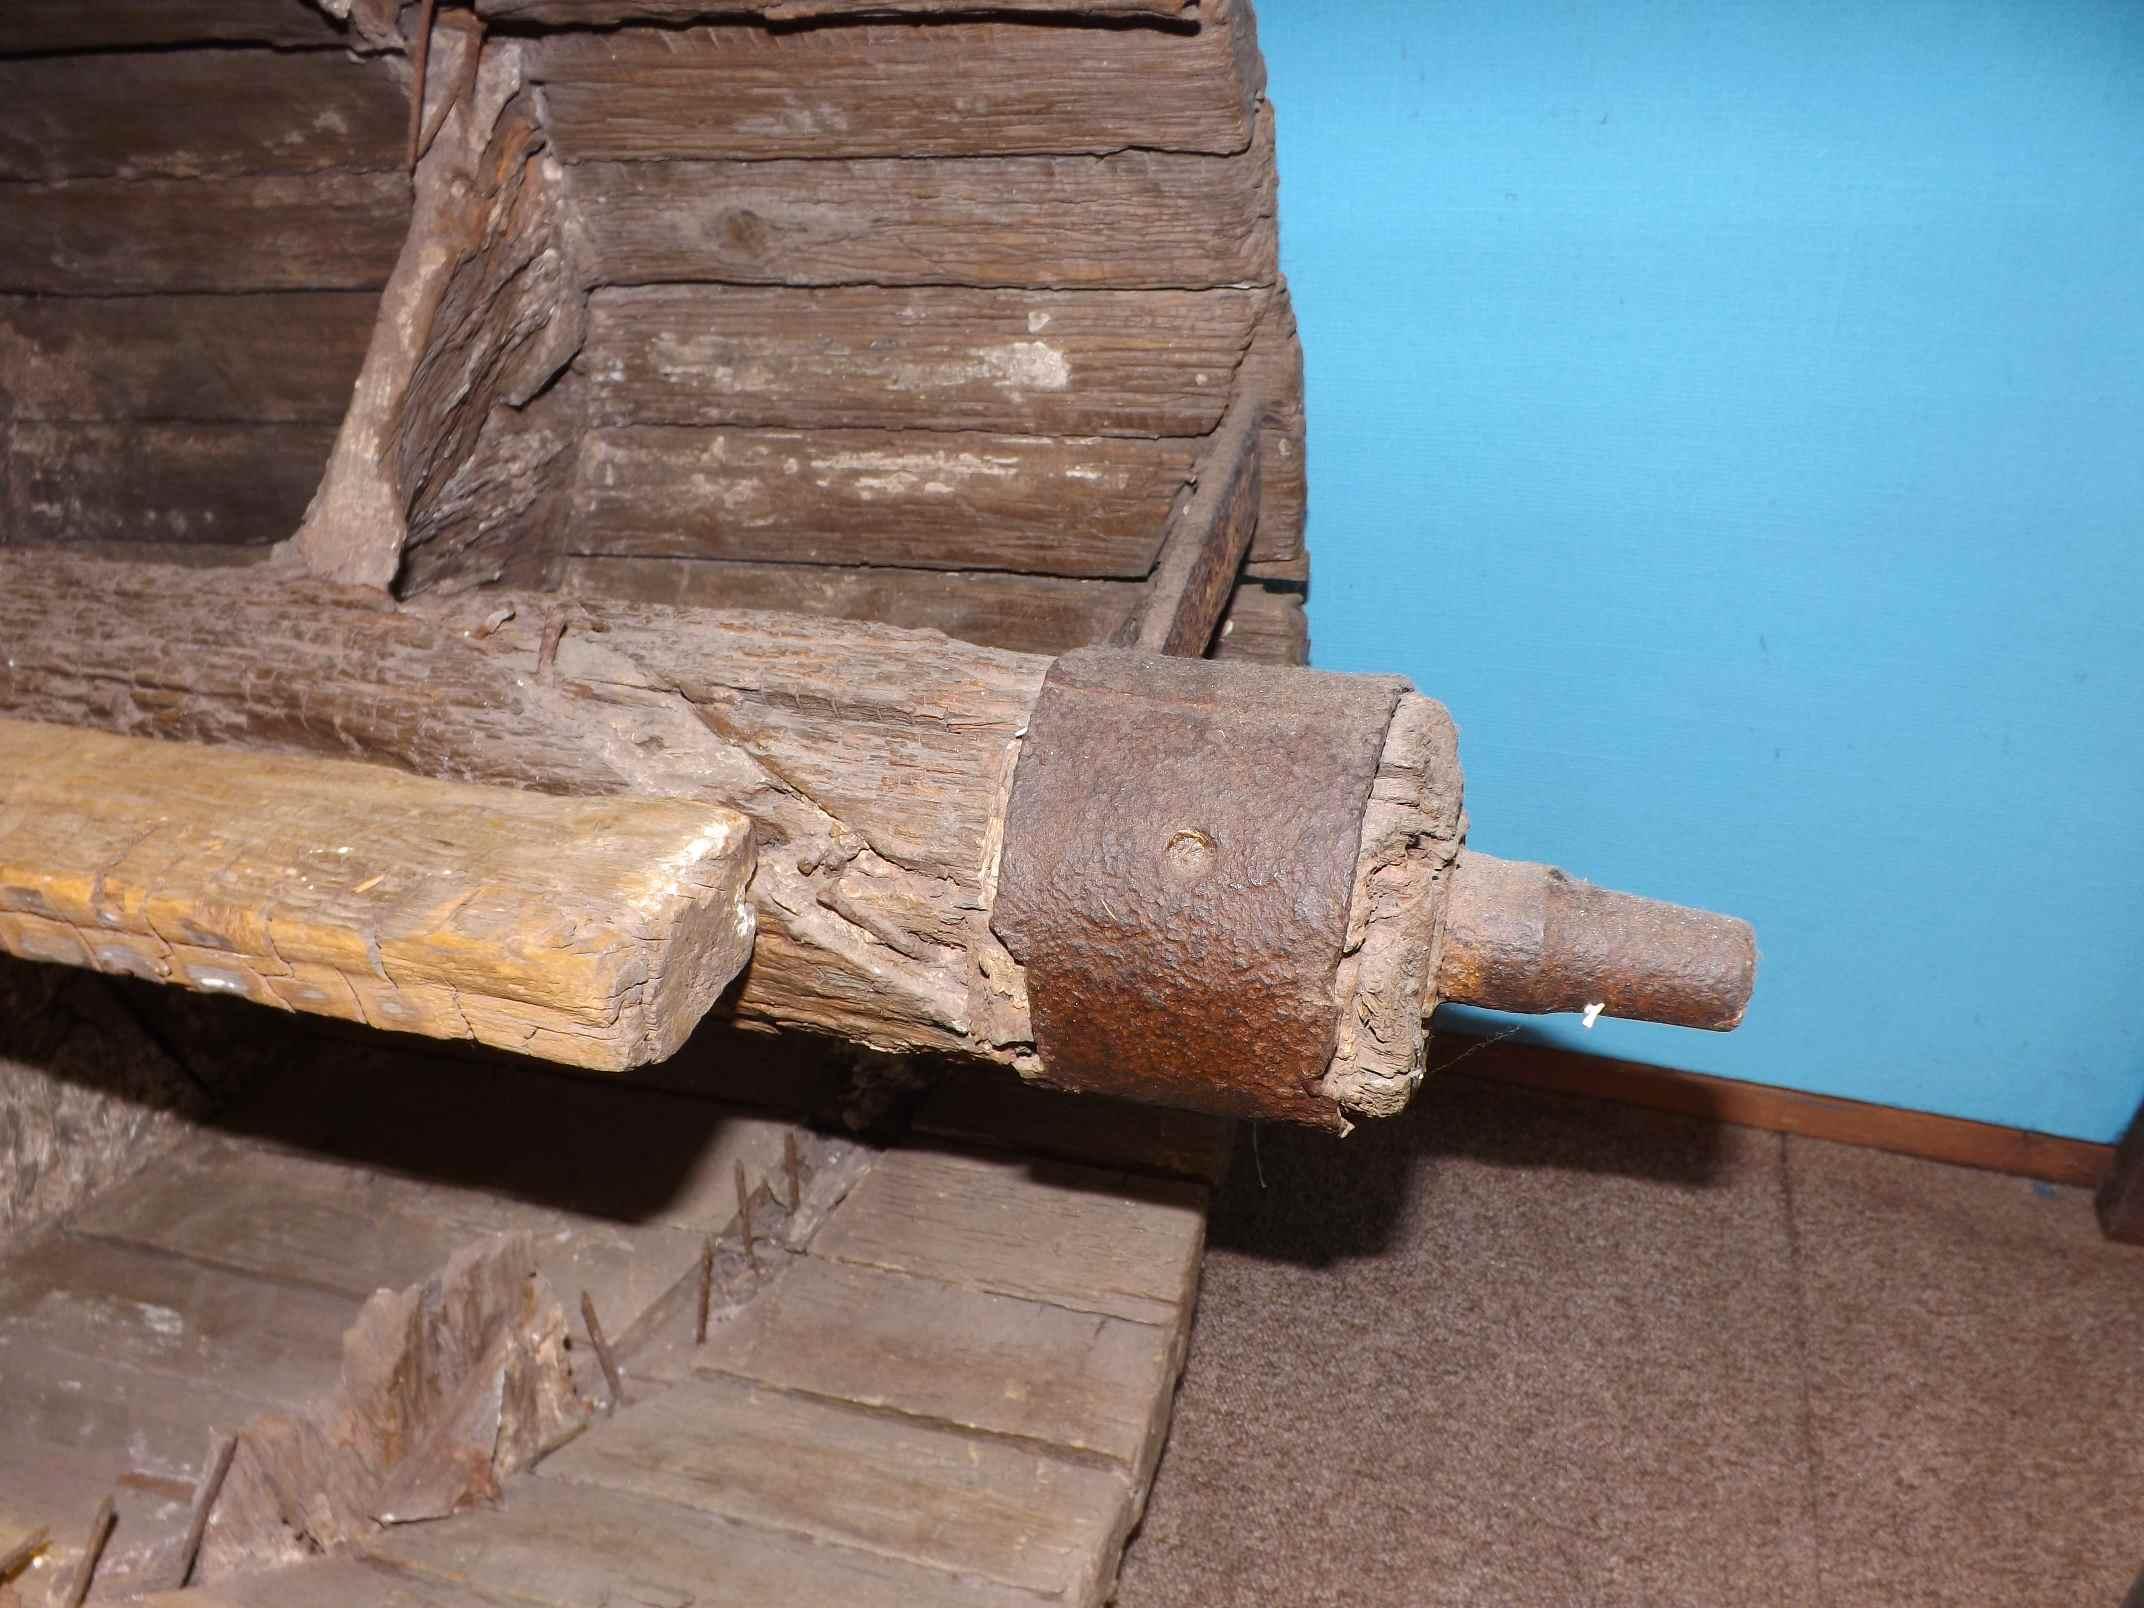 Archimedean Screw